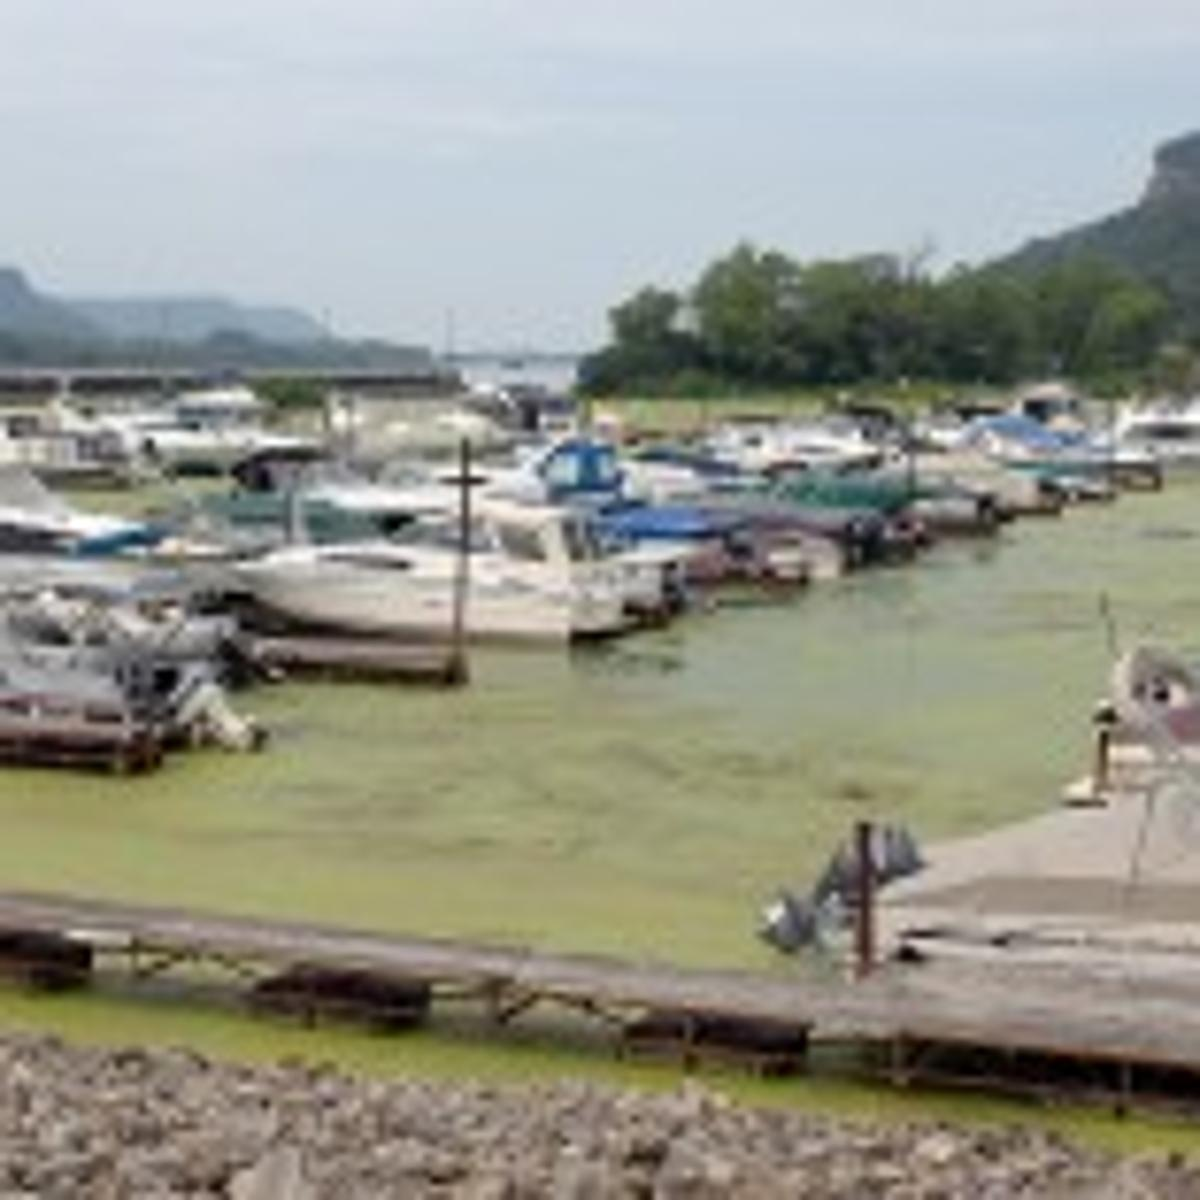 Trempealeau marina owner: Drawdown killed business, fish